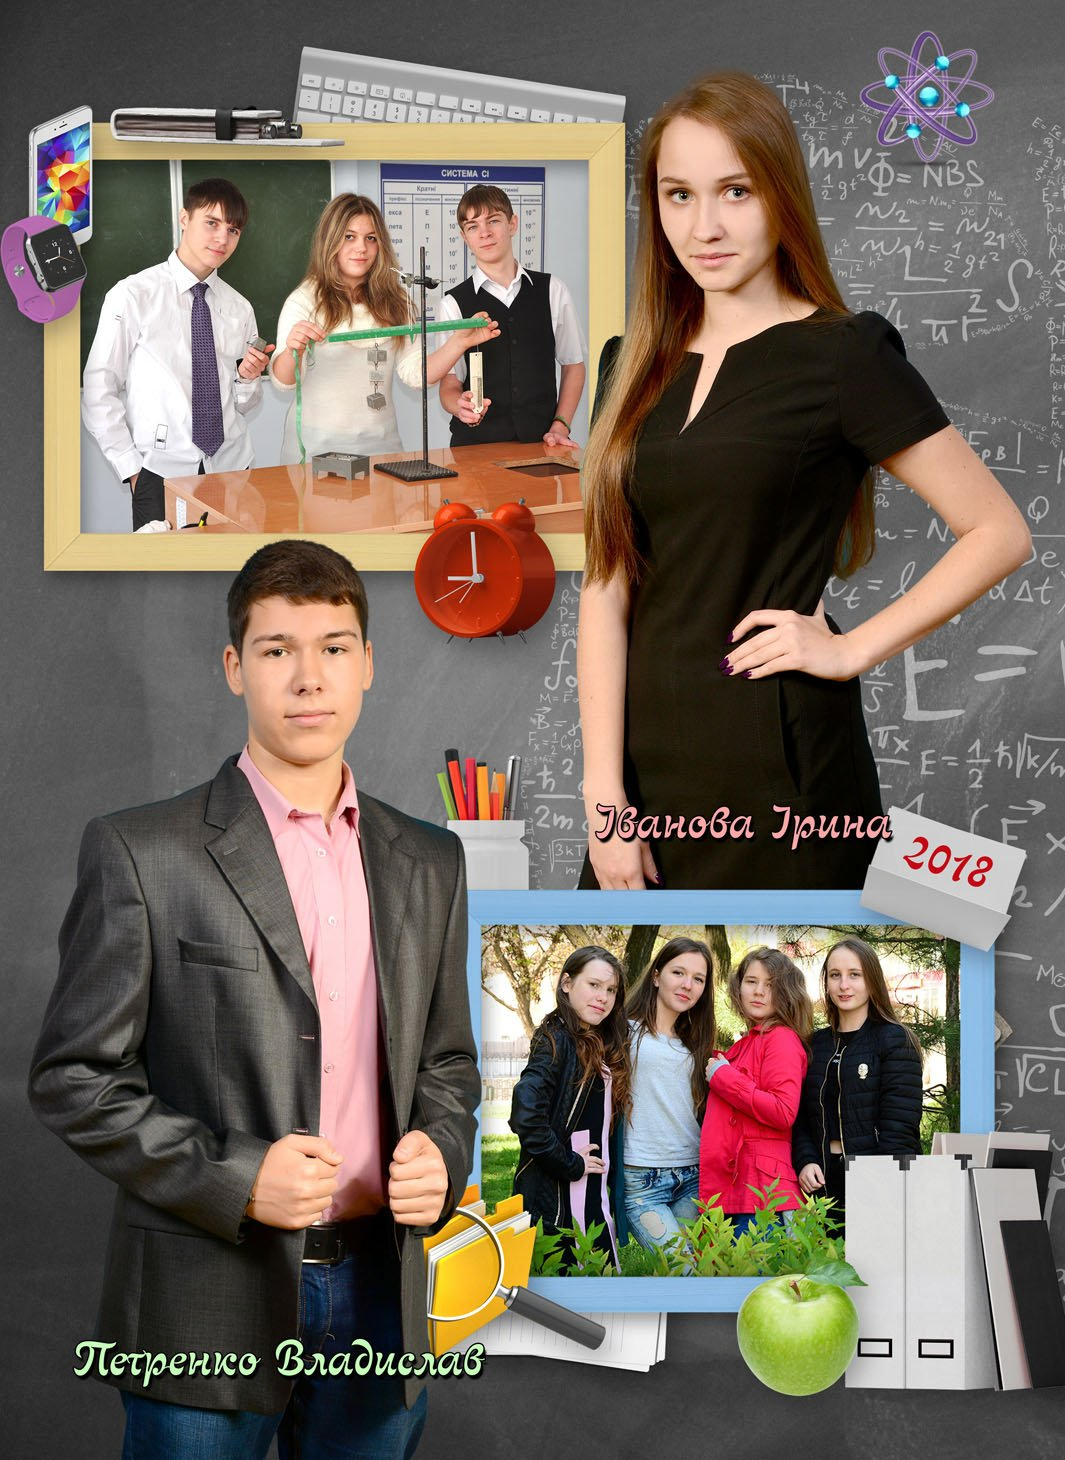 https://school-photo.com.ua/wp-content/uploads/2017/09/12-copy-1.jpg